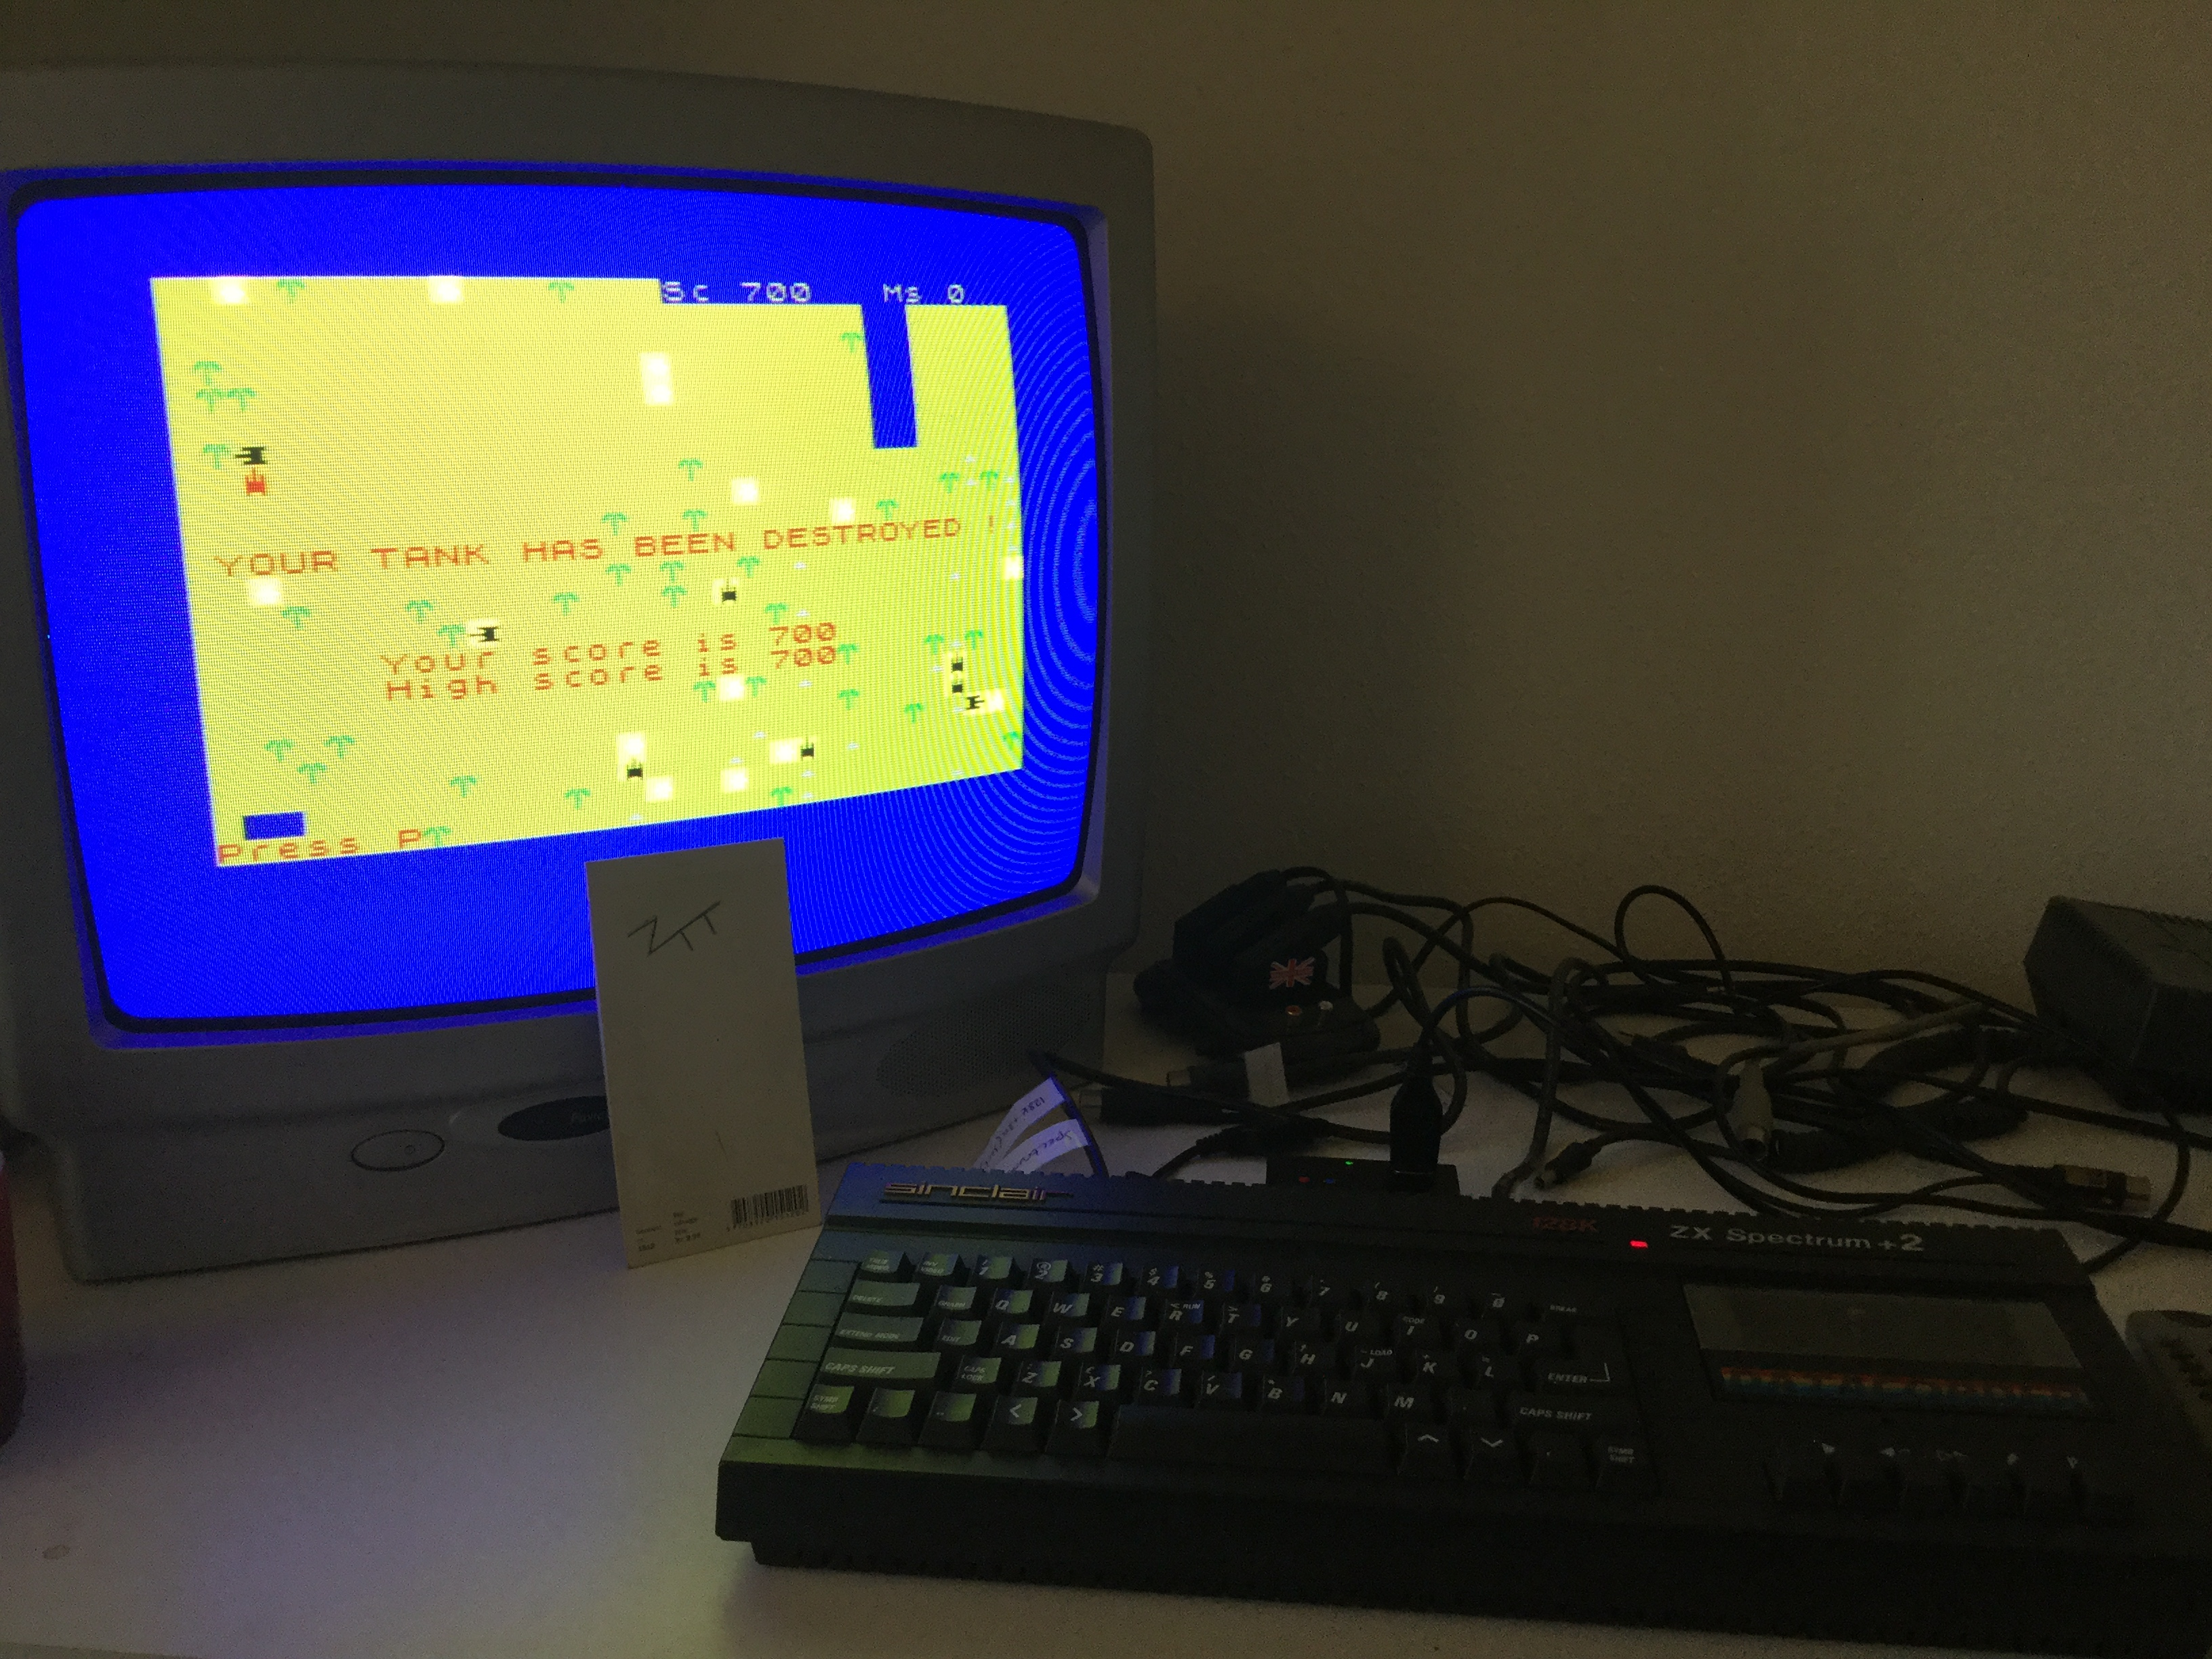 Frankie: Battle [Abacus Programs] (ZX Spectrum) 700 points on 2017-12-28 03:01:26